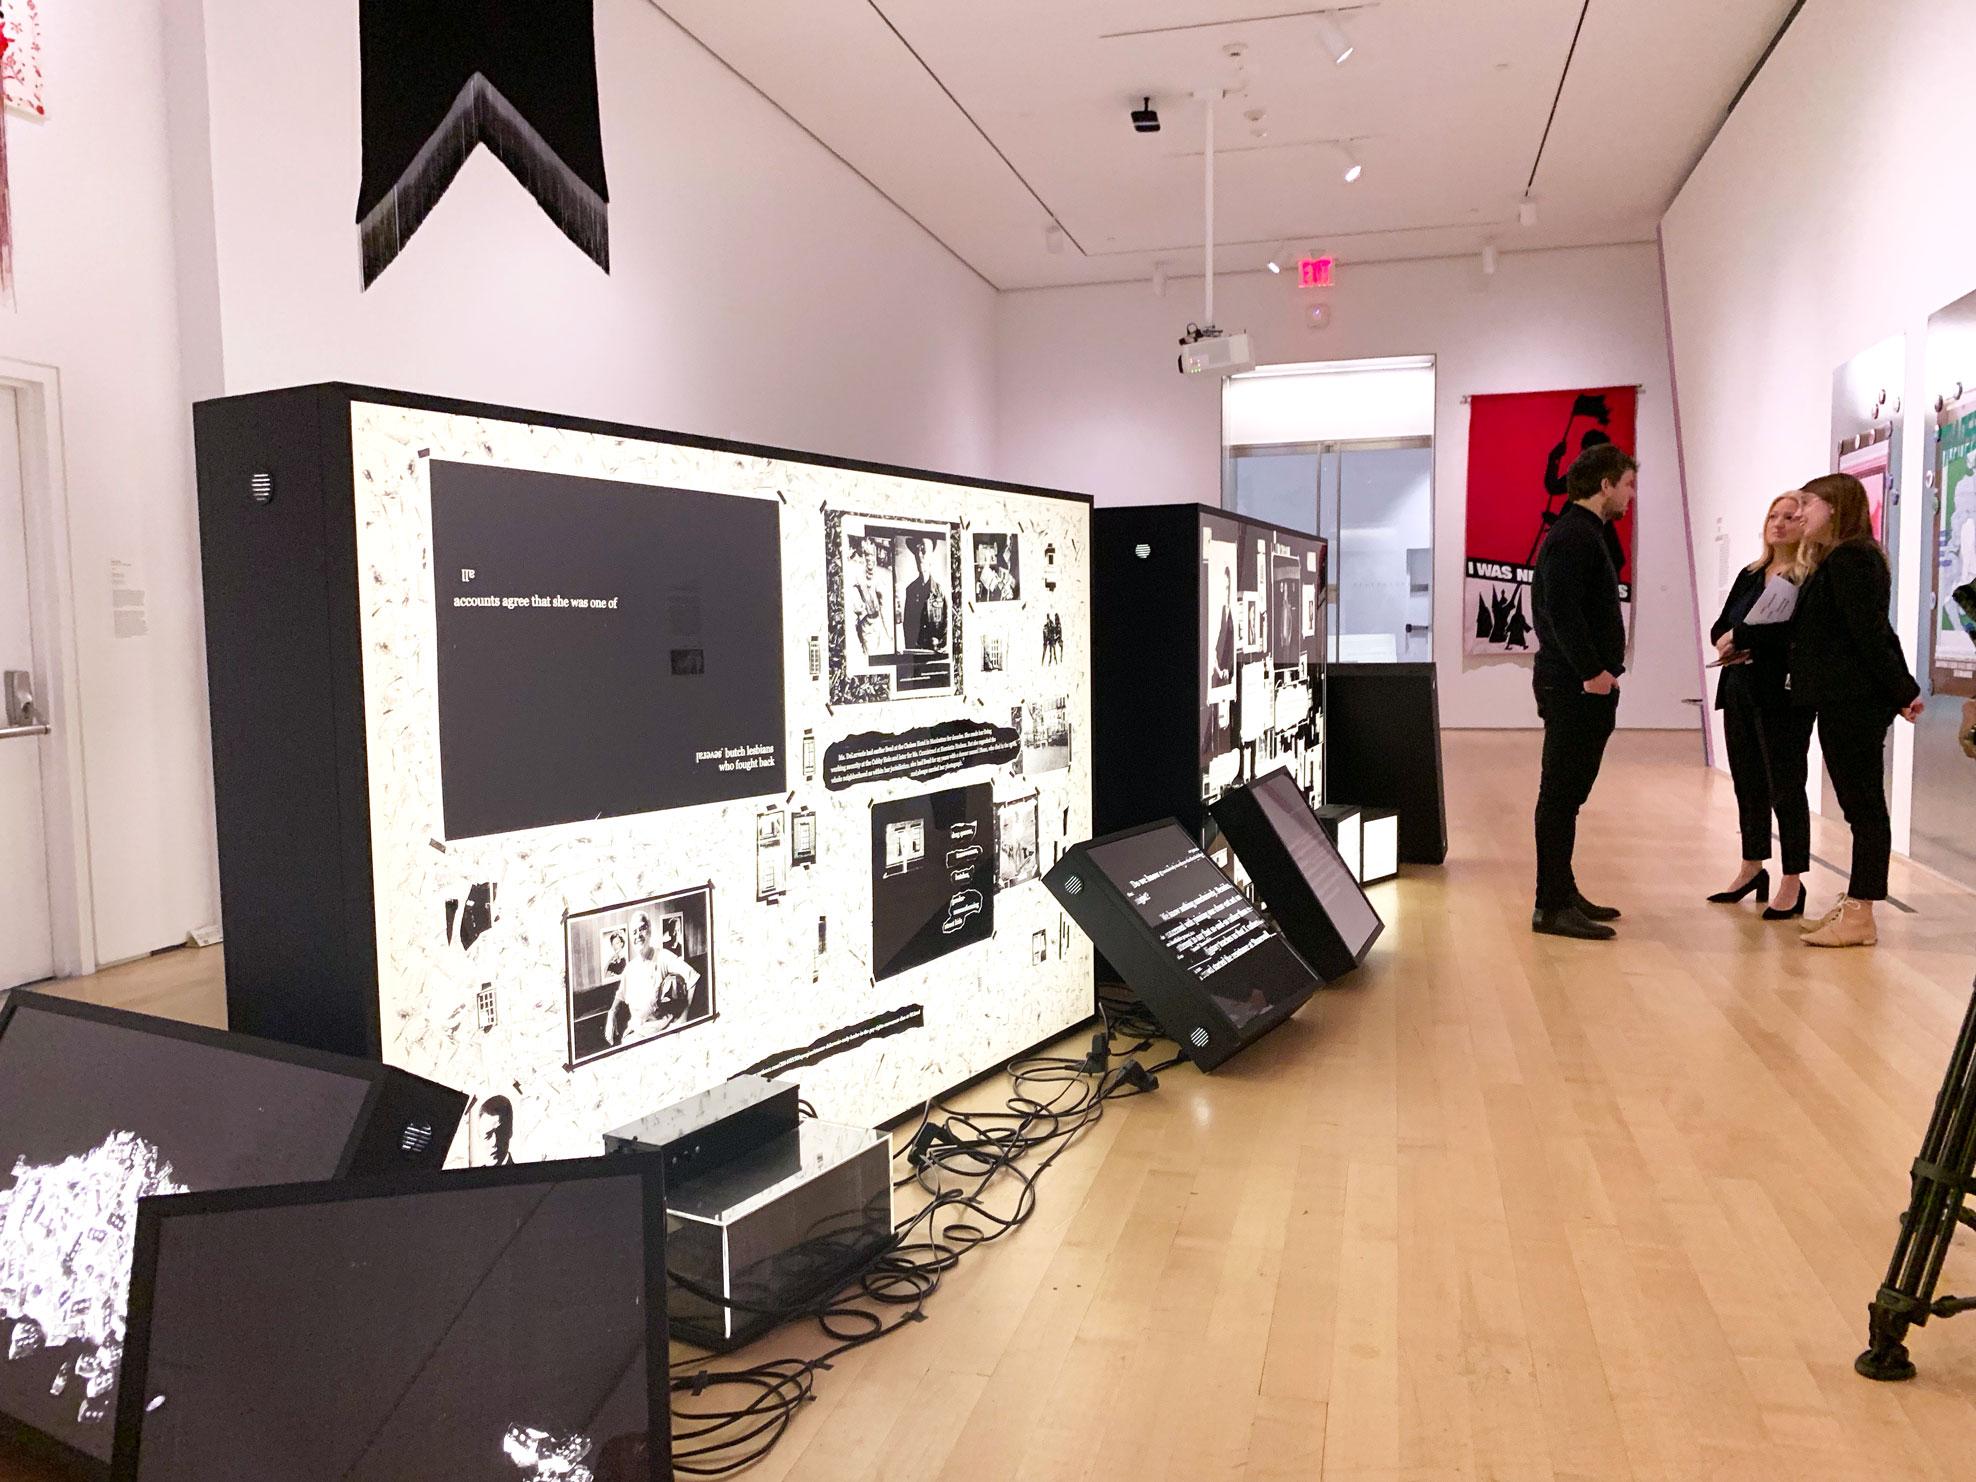 brooklyn-museum-lgbt-exhibit.jpg?1558870523